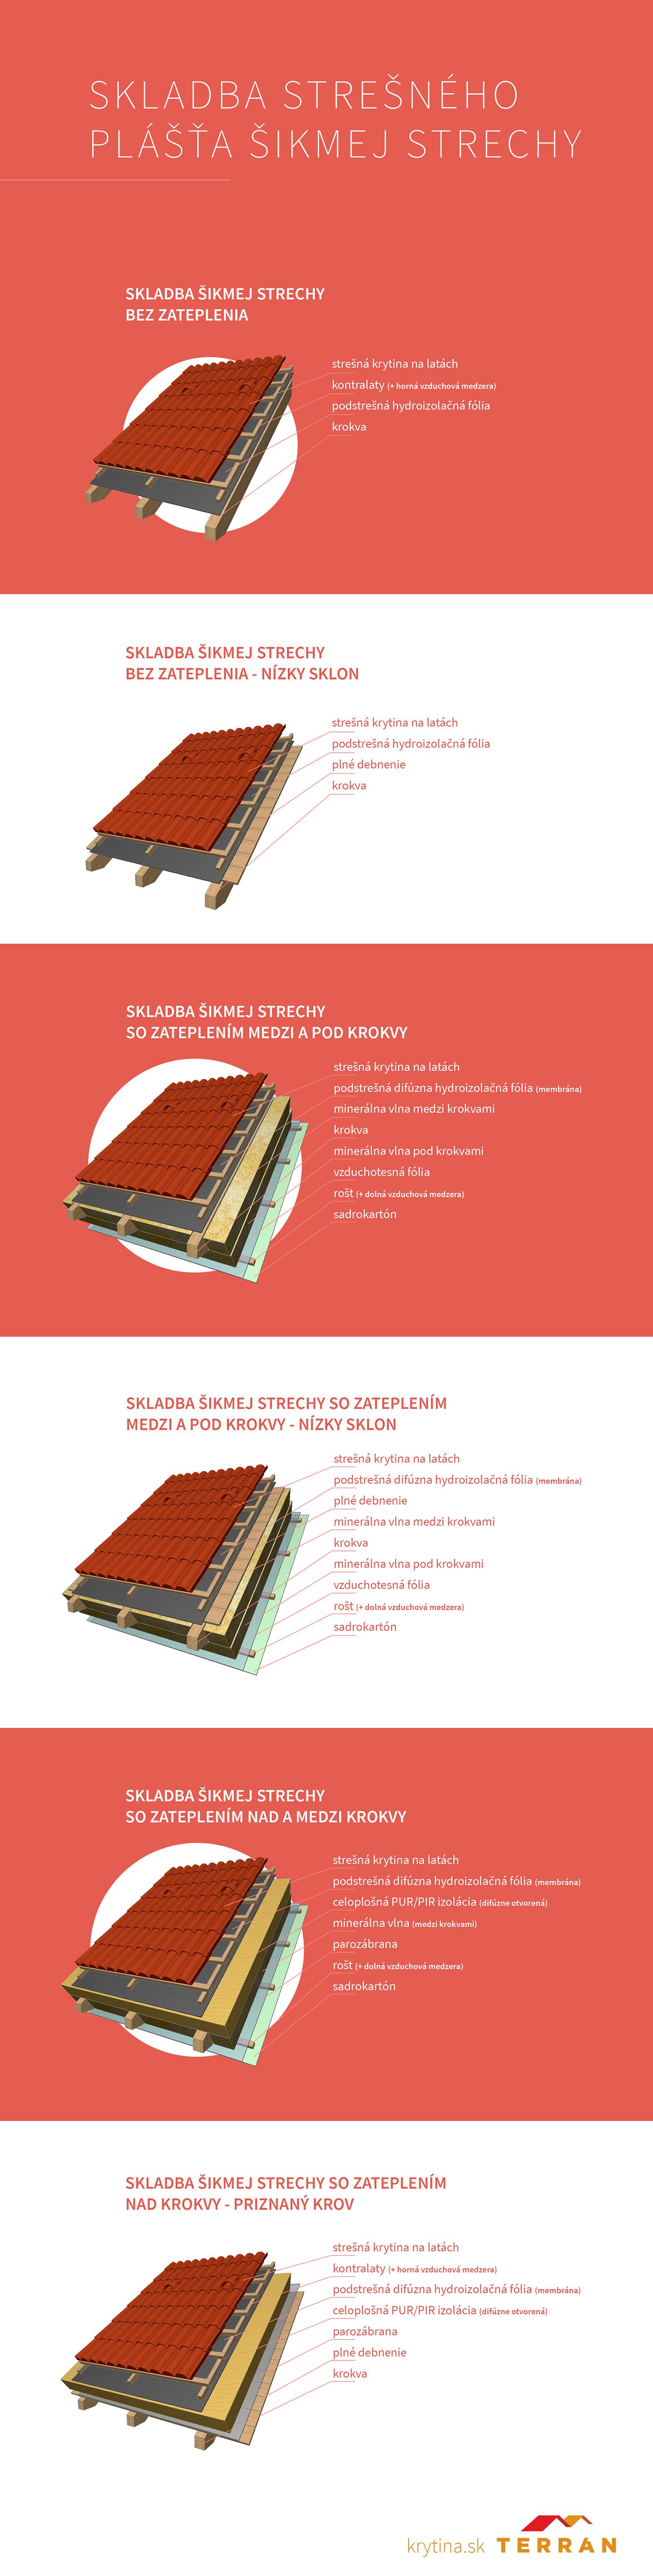 infografika-skladba-stresneho-plasta-sikmenj-strechy